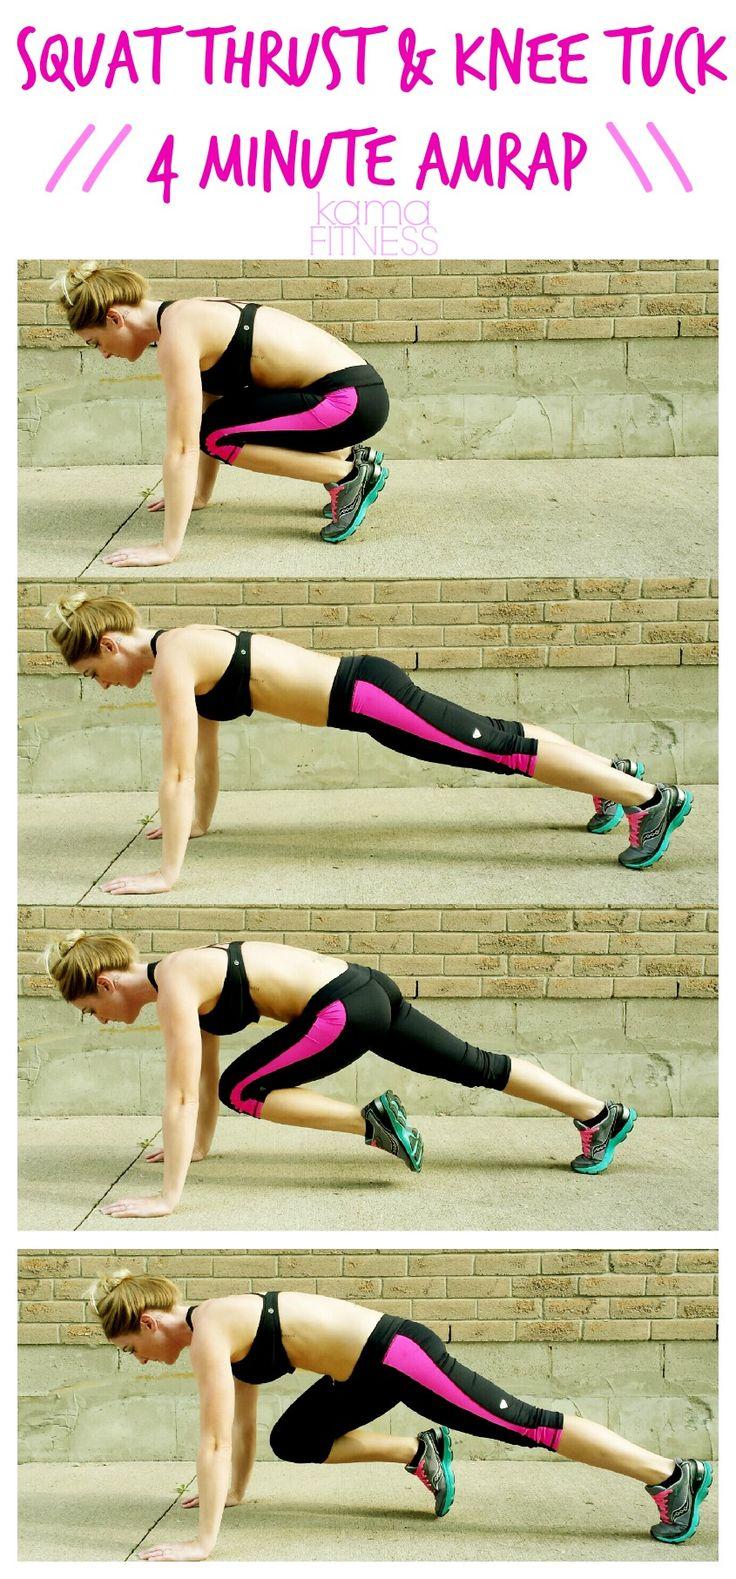 squat-thrust-knee-tuck-4-minute-amrap-workout-kama-fitness